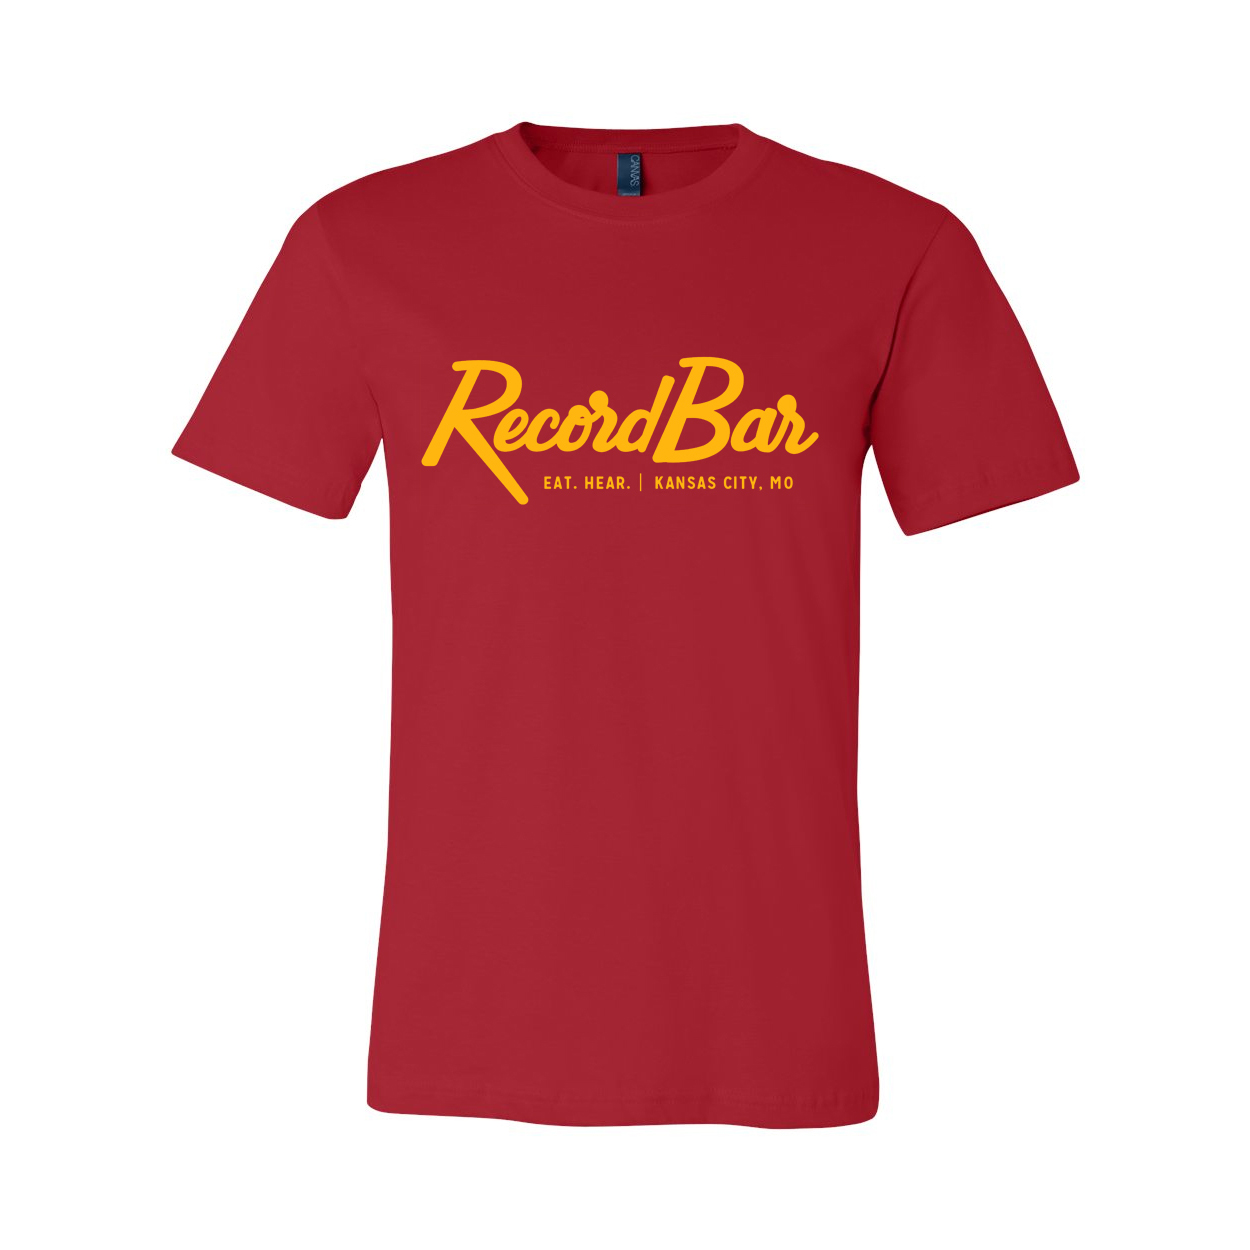 Red and Yellow Rocker Tee - recordBar